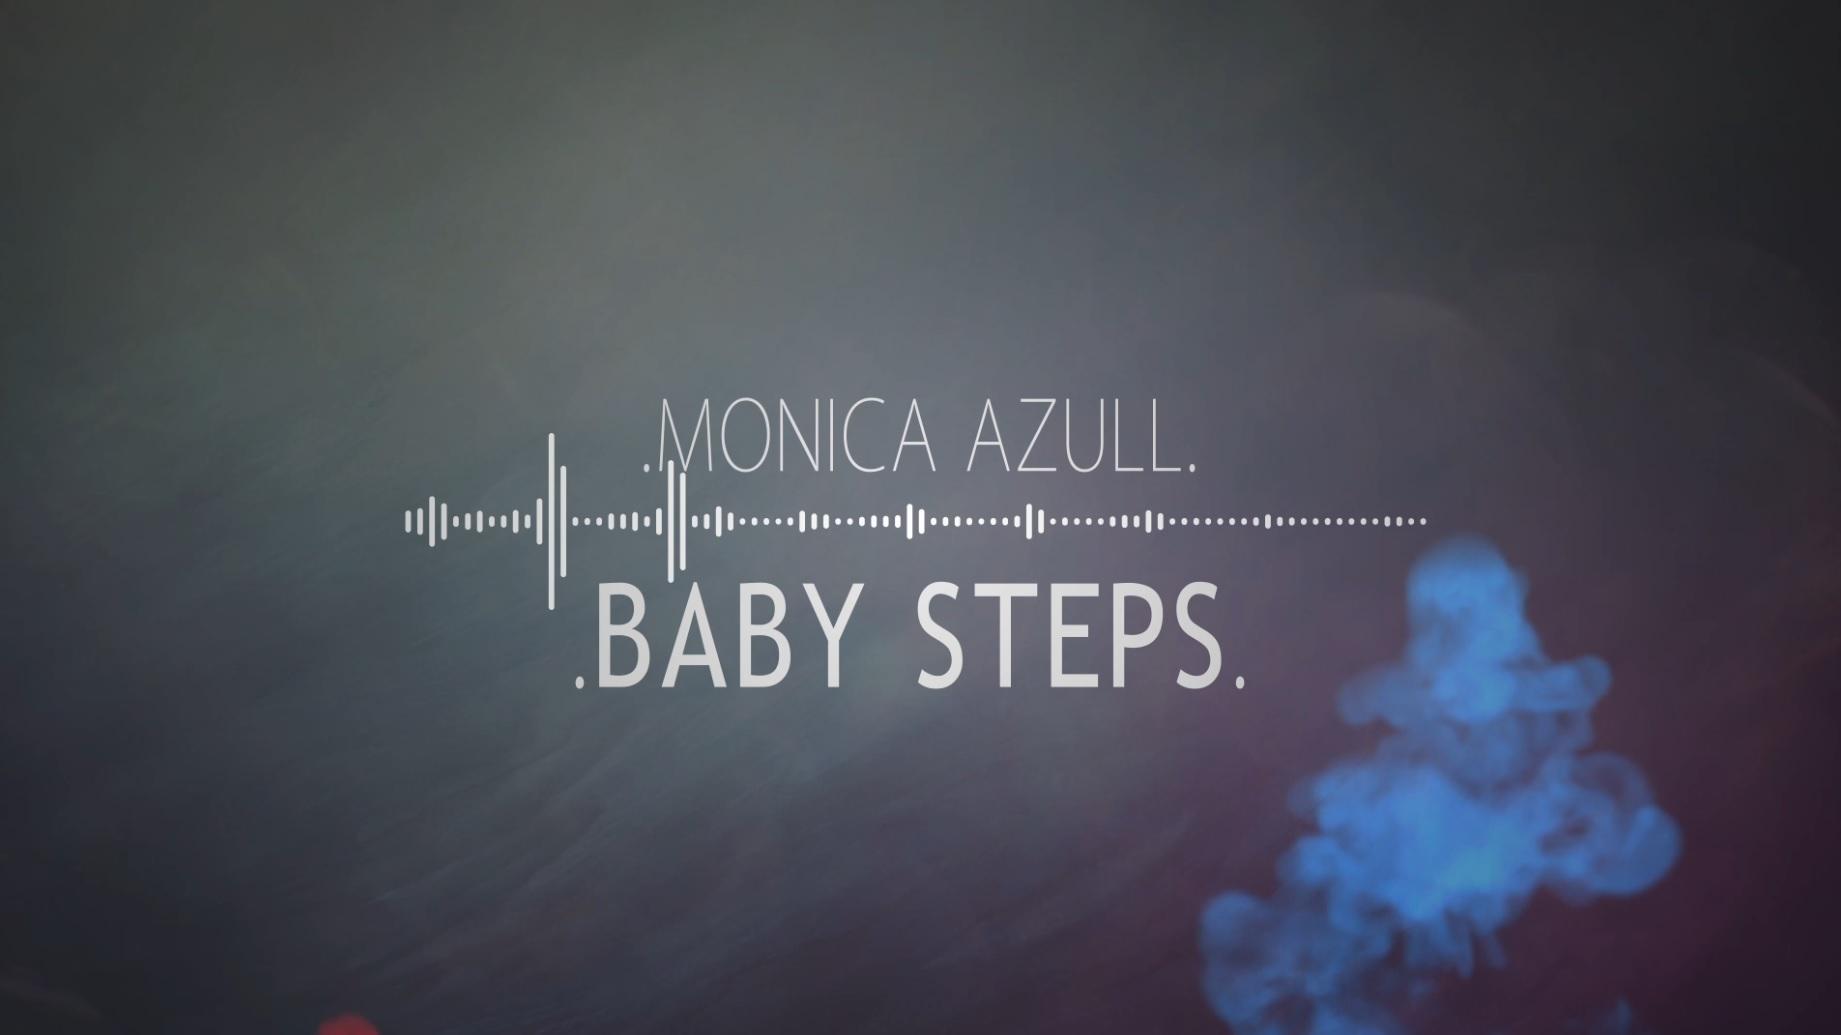 Monica Azull 'Baby Steps'